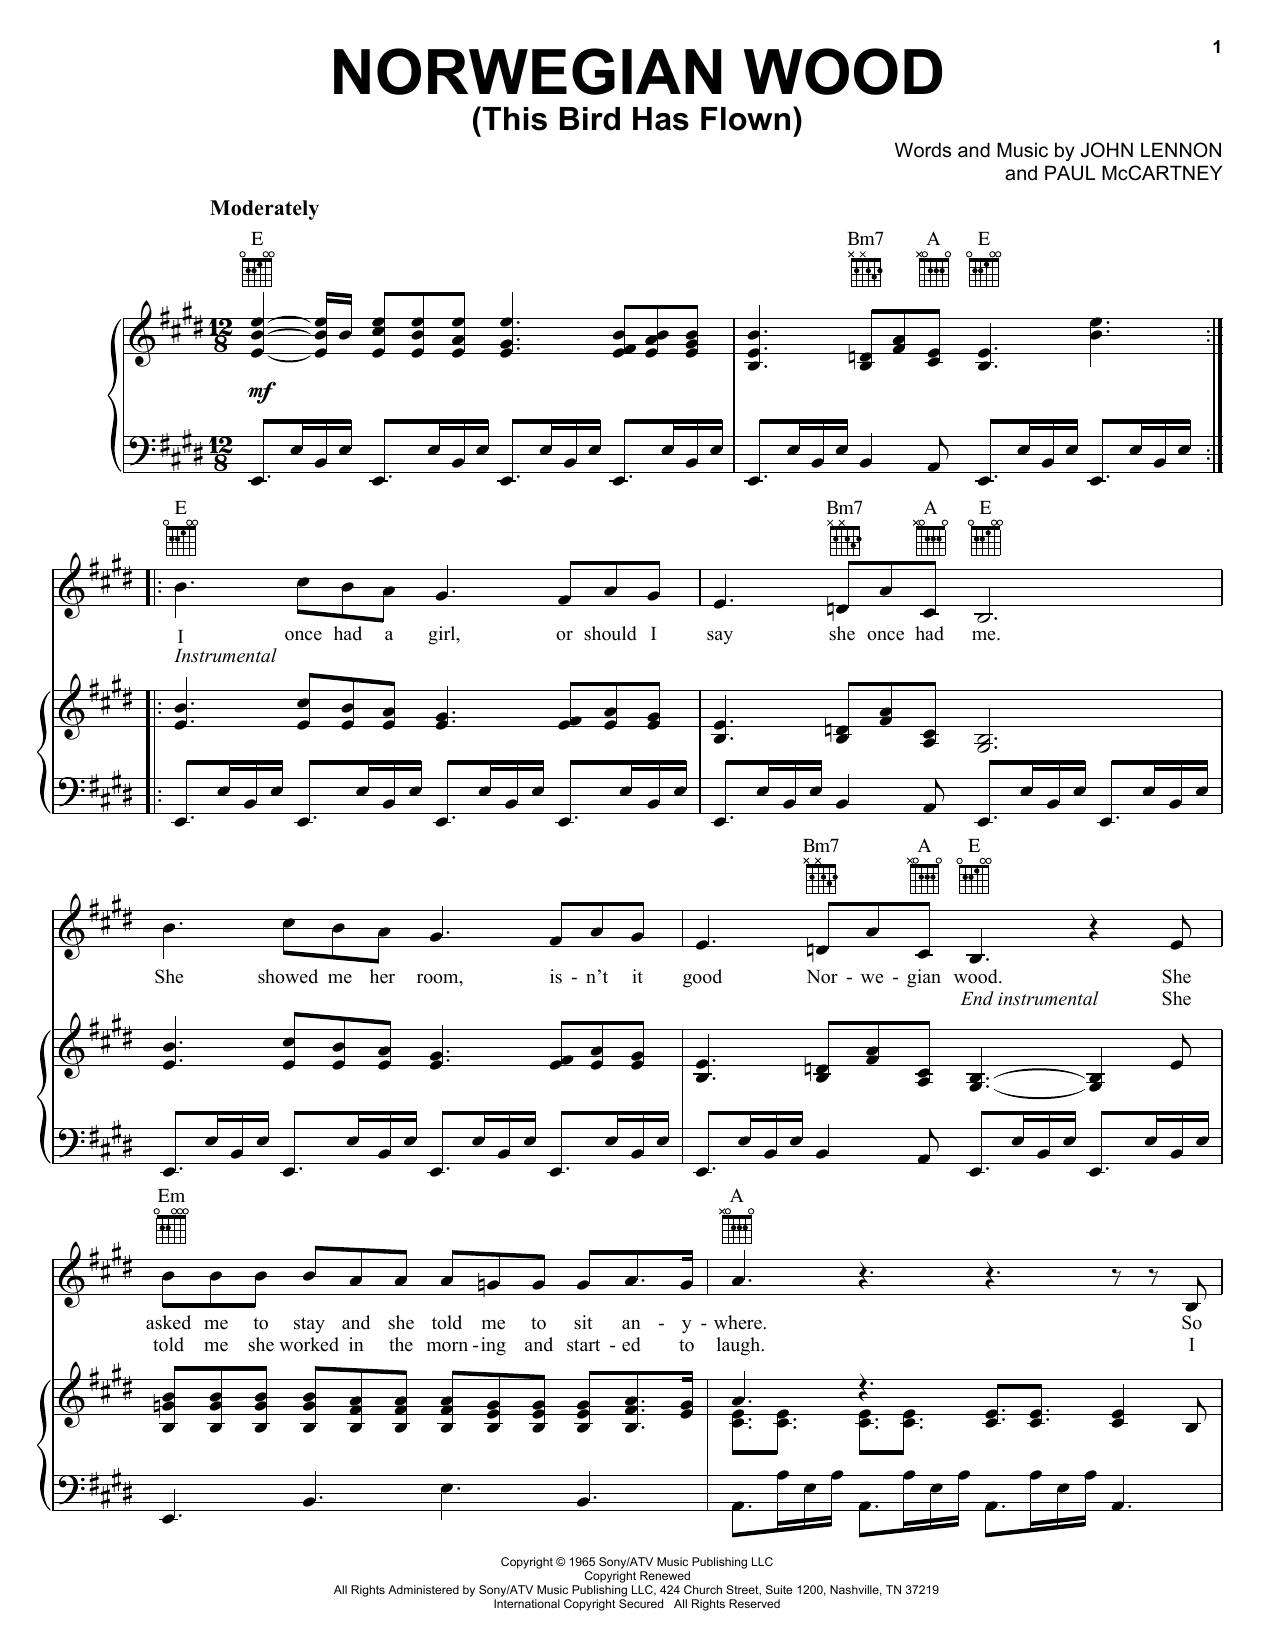 Norwegian Wood (This Bird Has Flown) sheet music